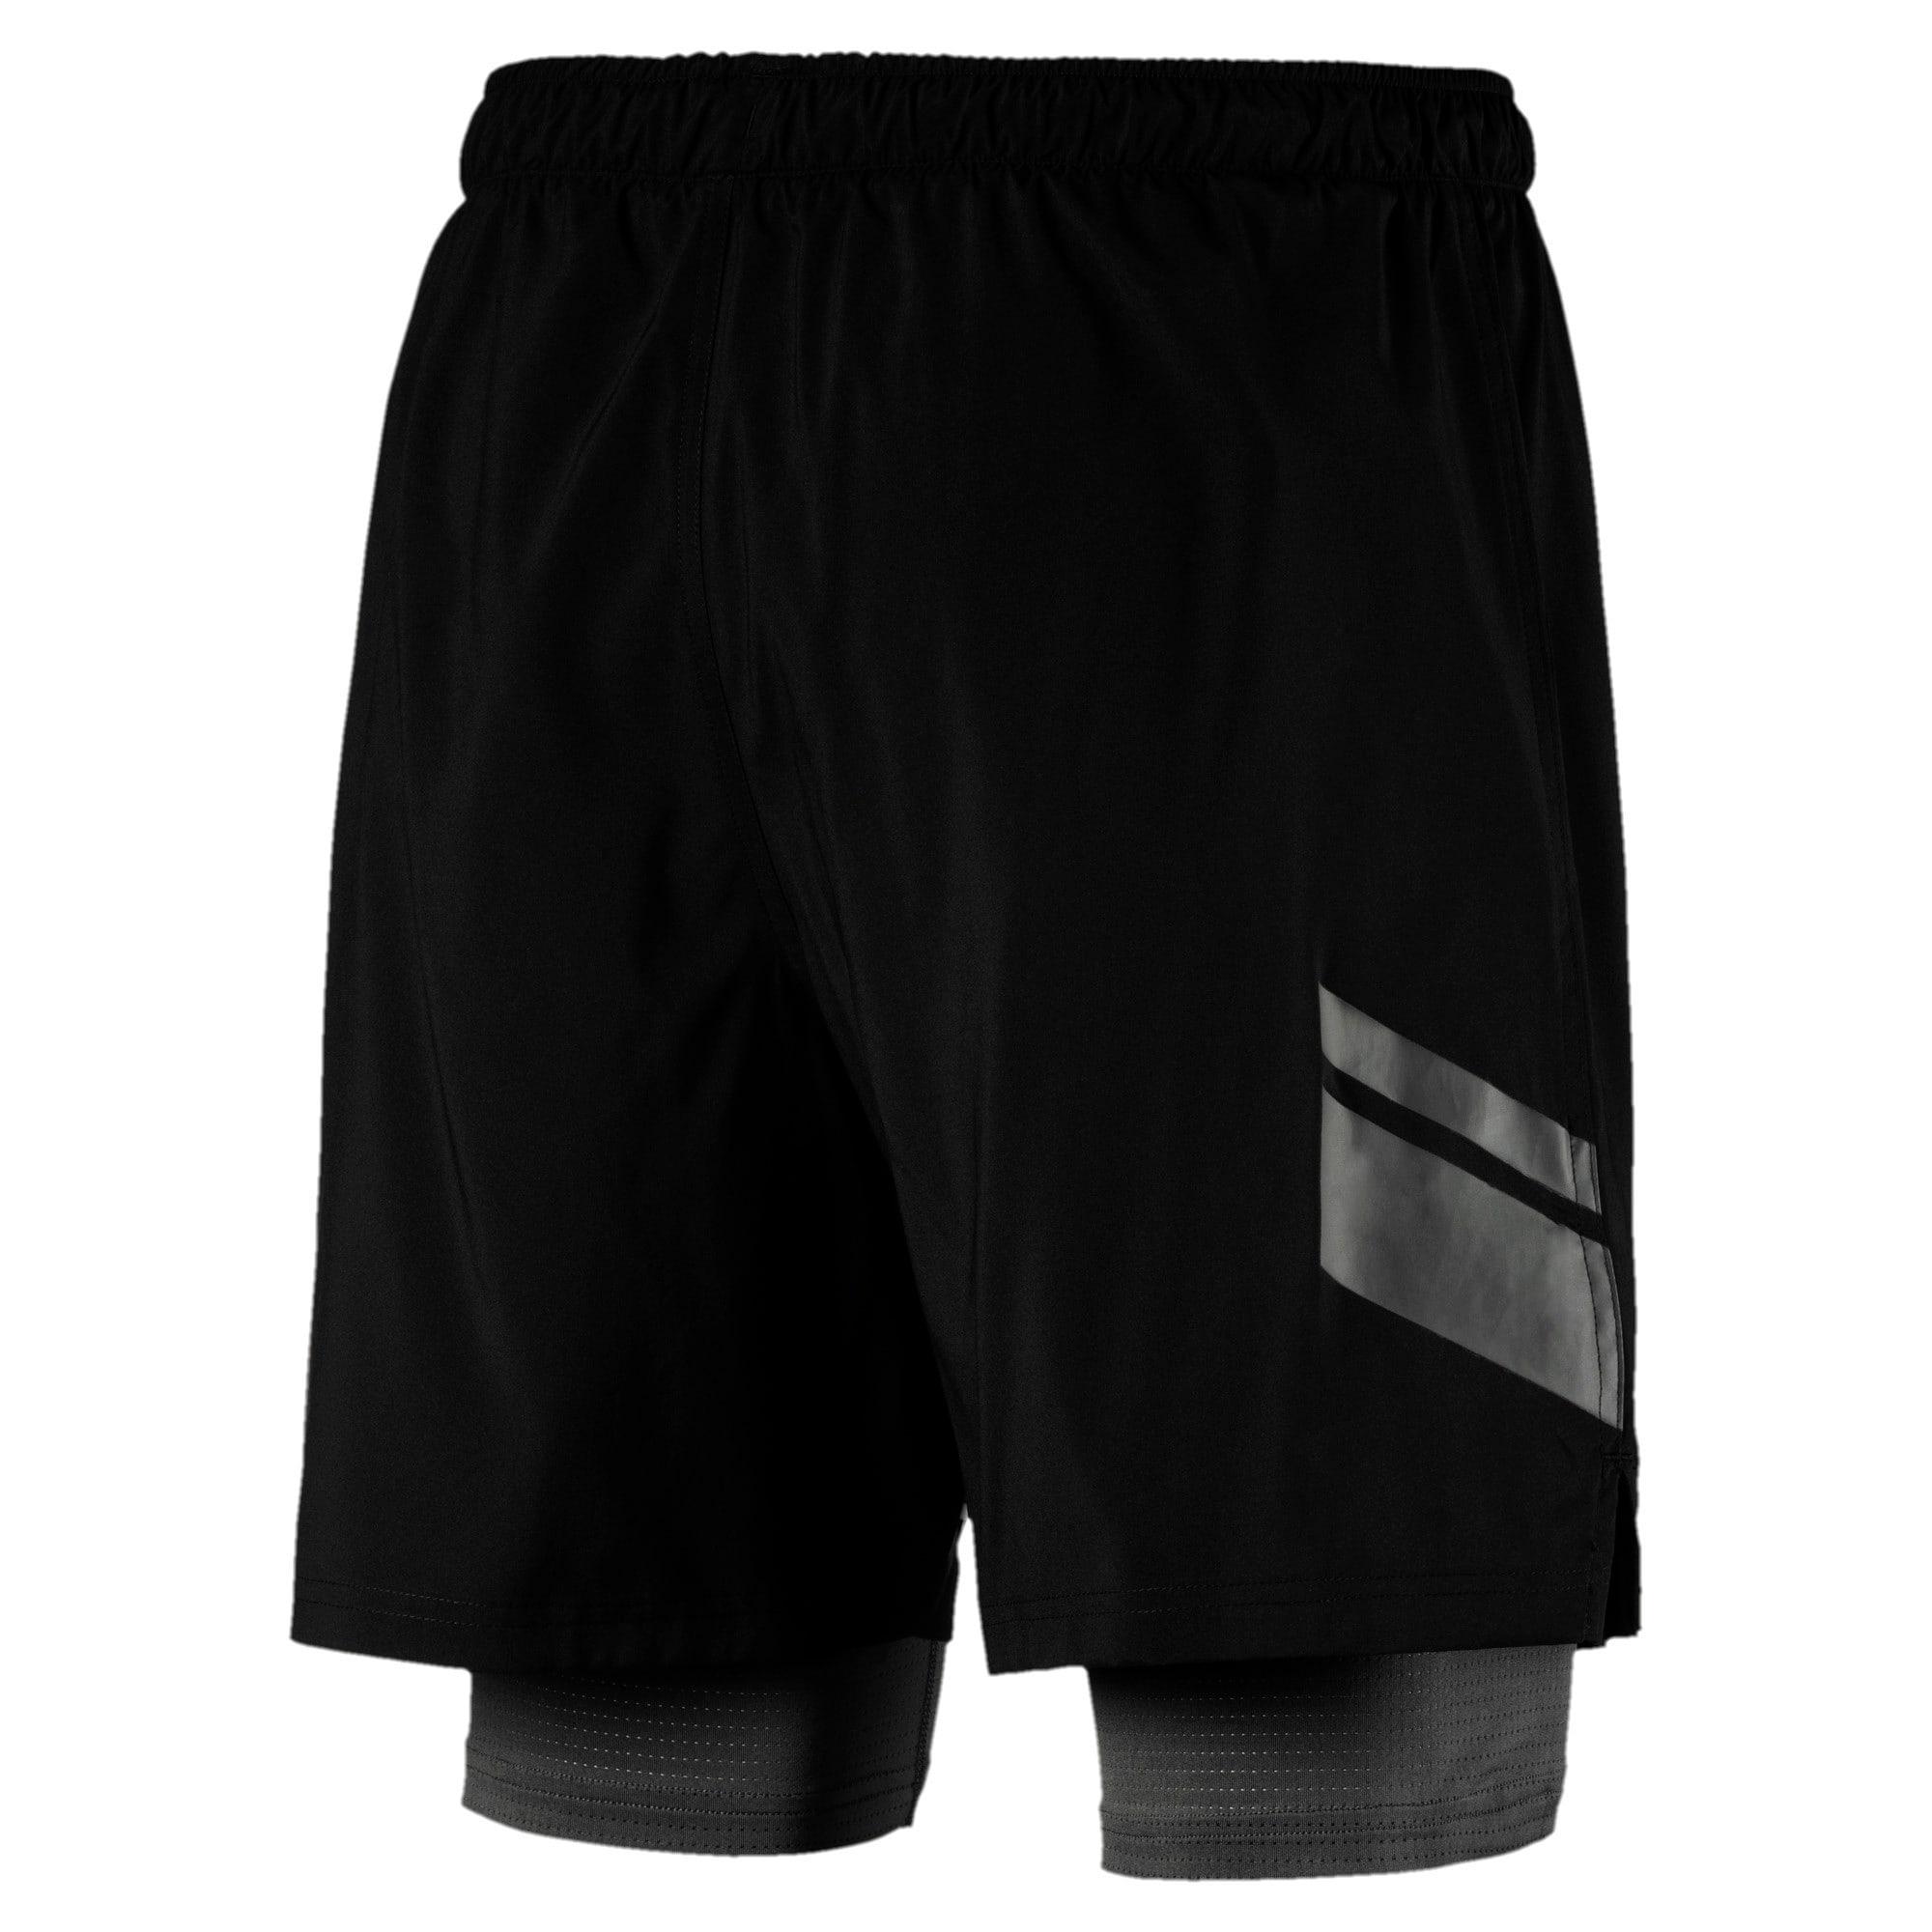 Thumbnail 5 of Running Men's IGNITE 2-in-1 Shorts, Puma Black, medium-IND